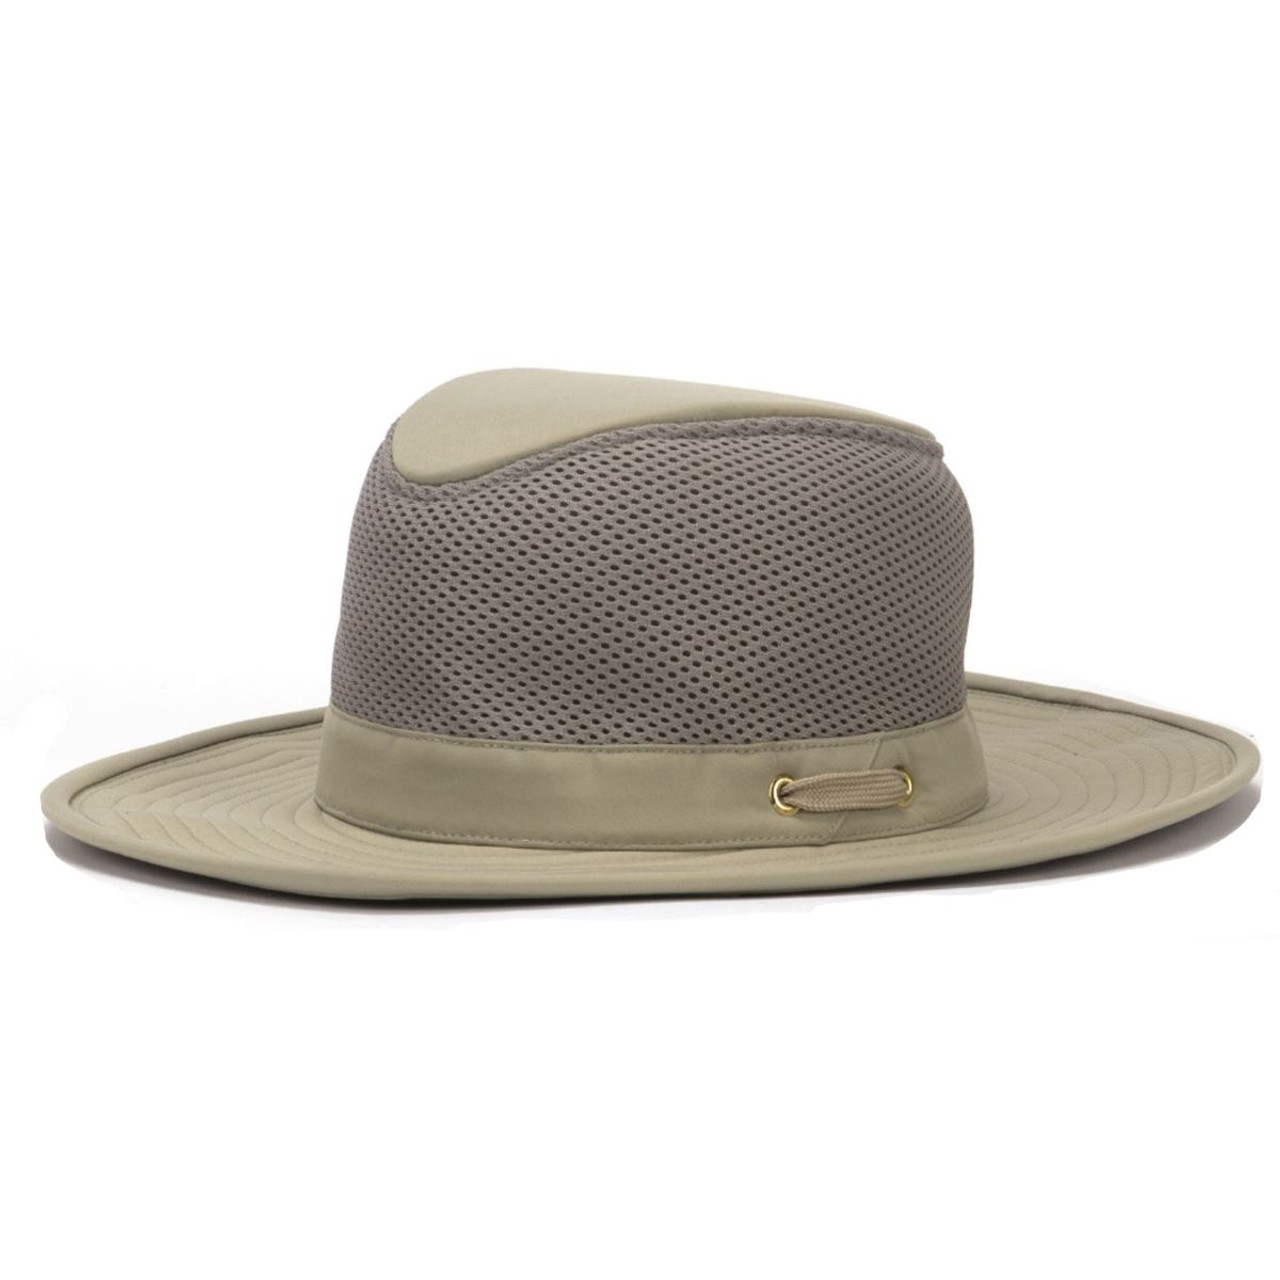 Tilley LTM8 Broad Brim Airflo Hat